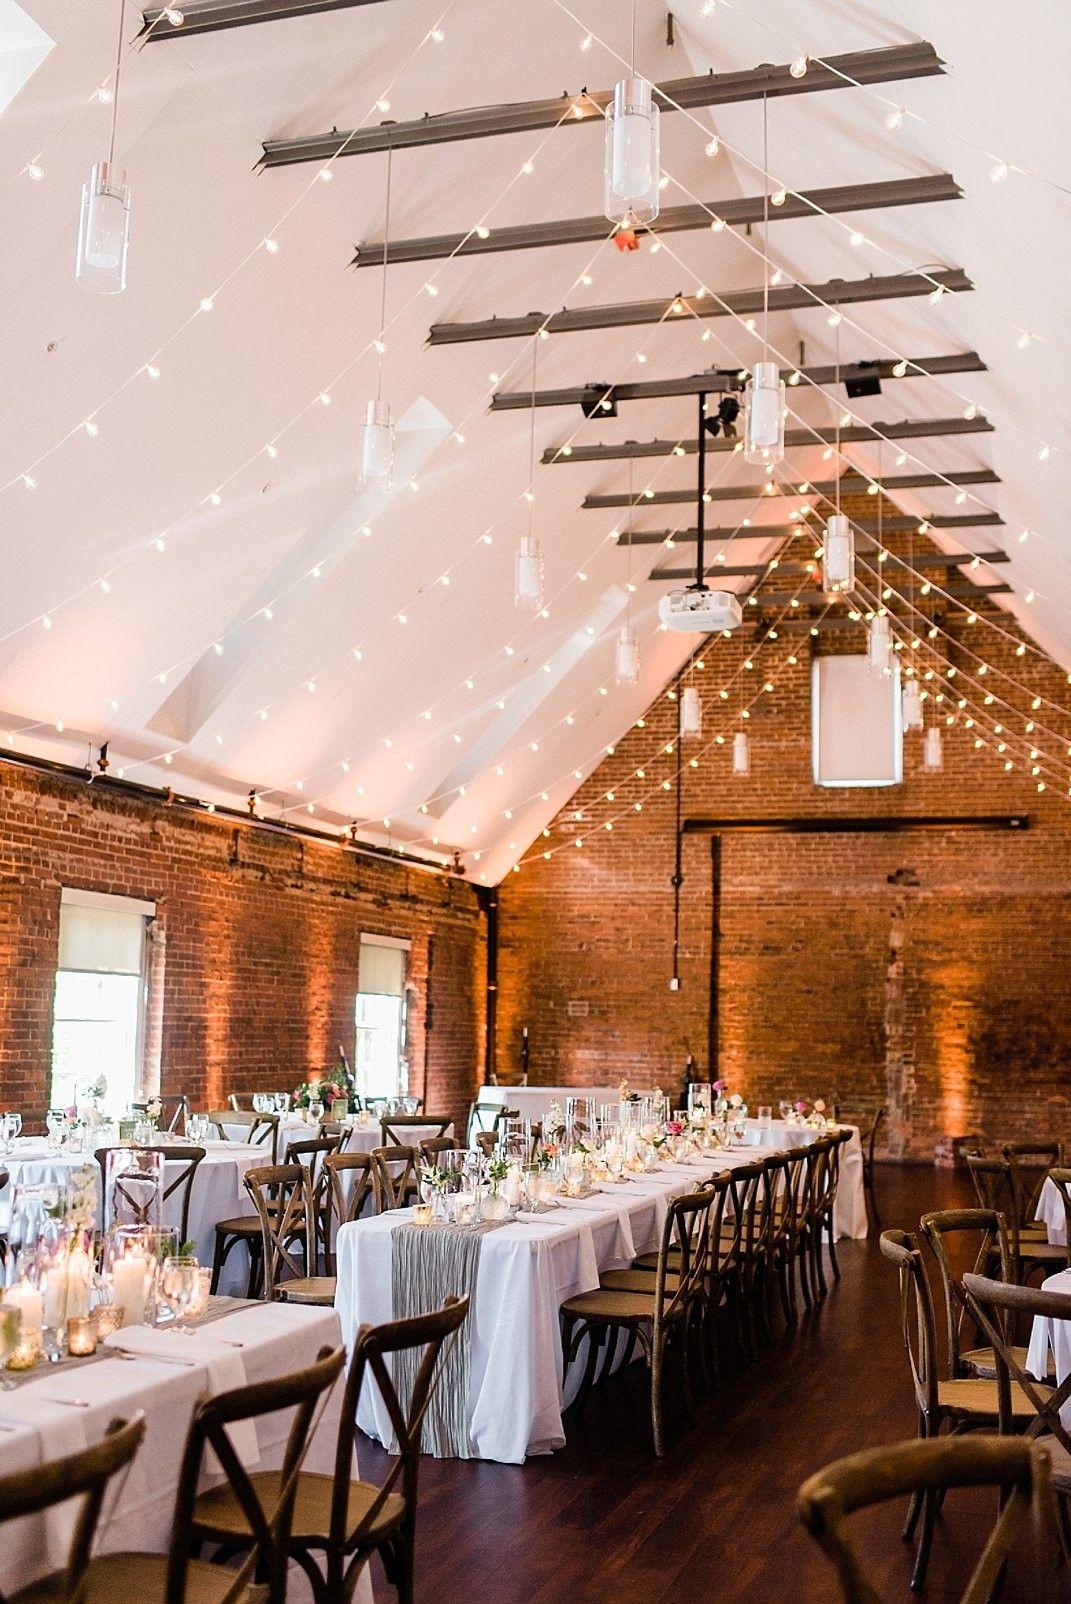 Melanie & Ian Indoor wedding receptions, Indoor wedding